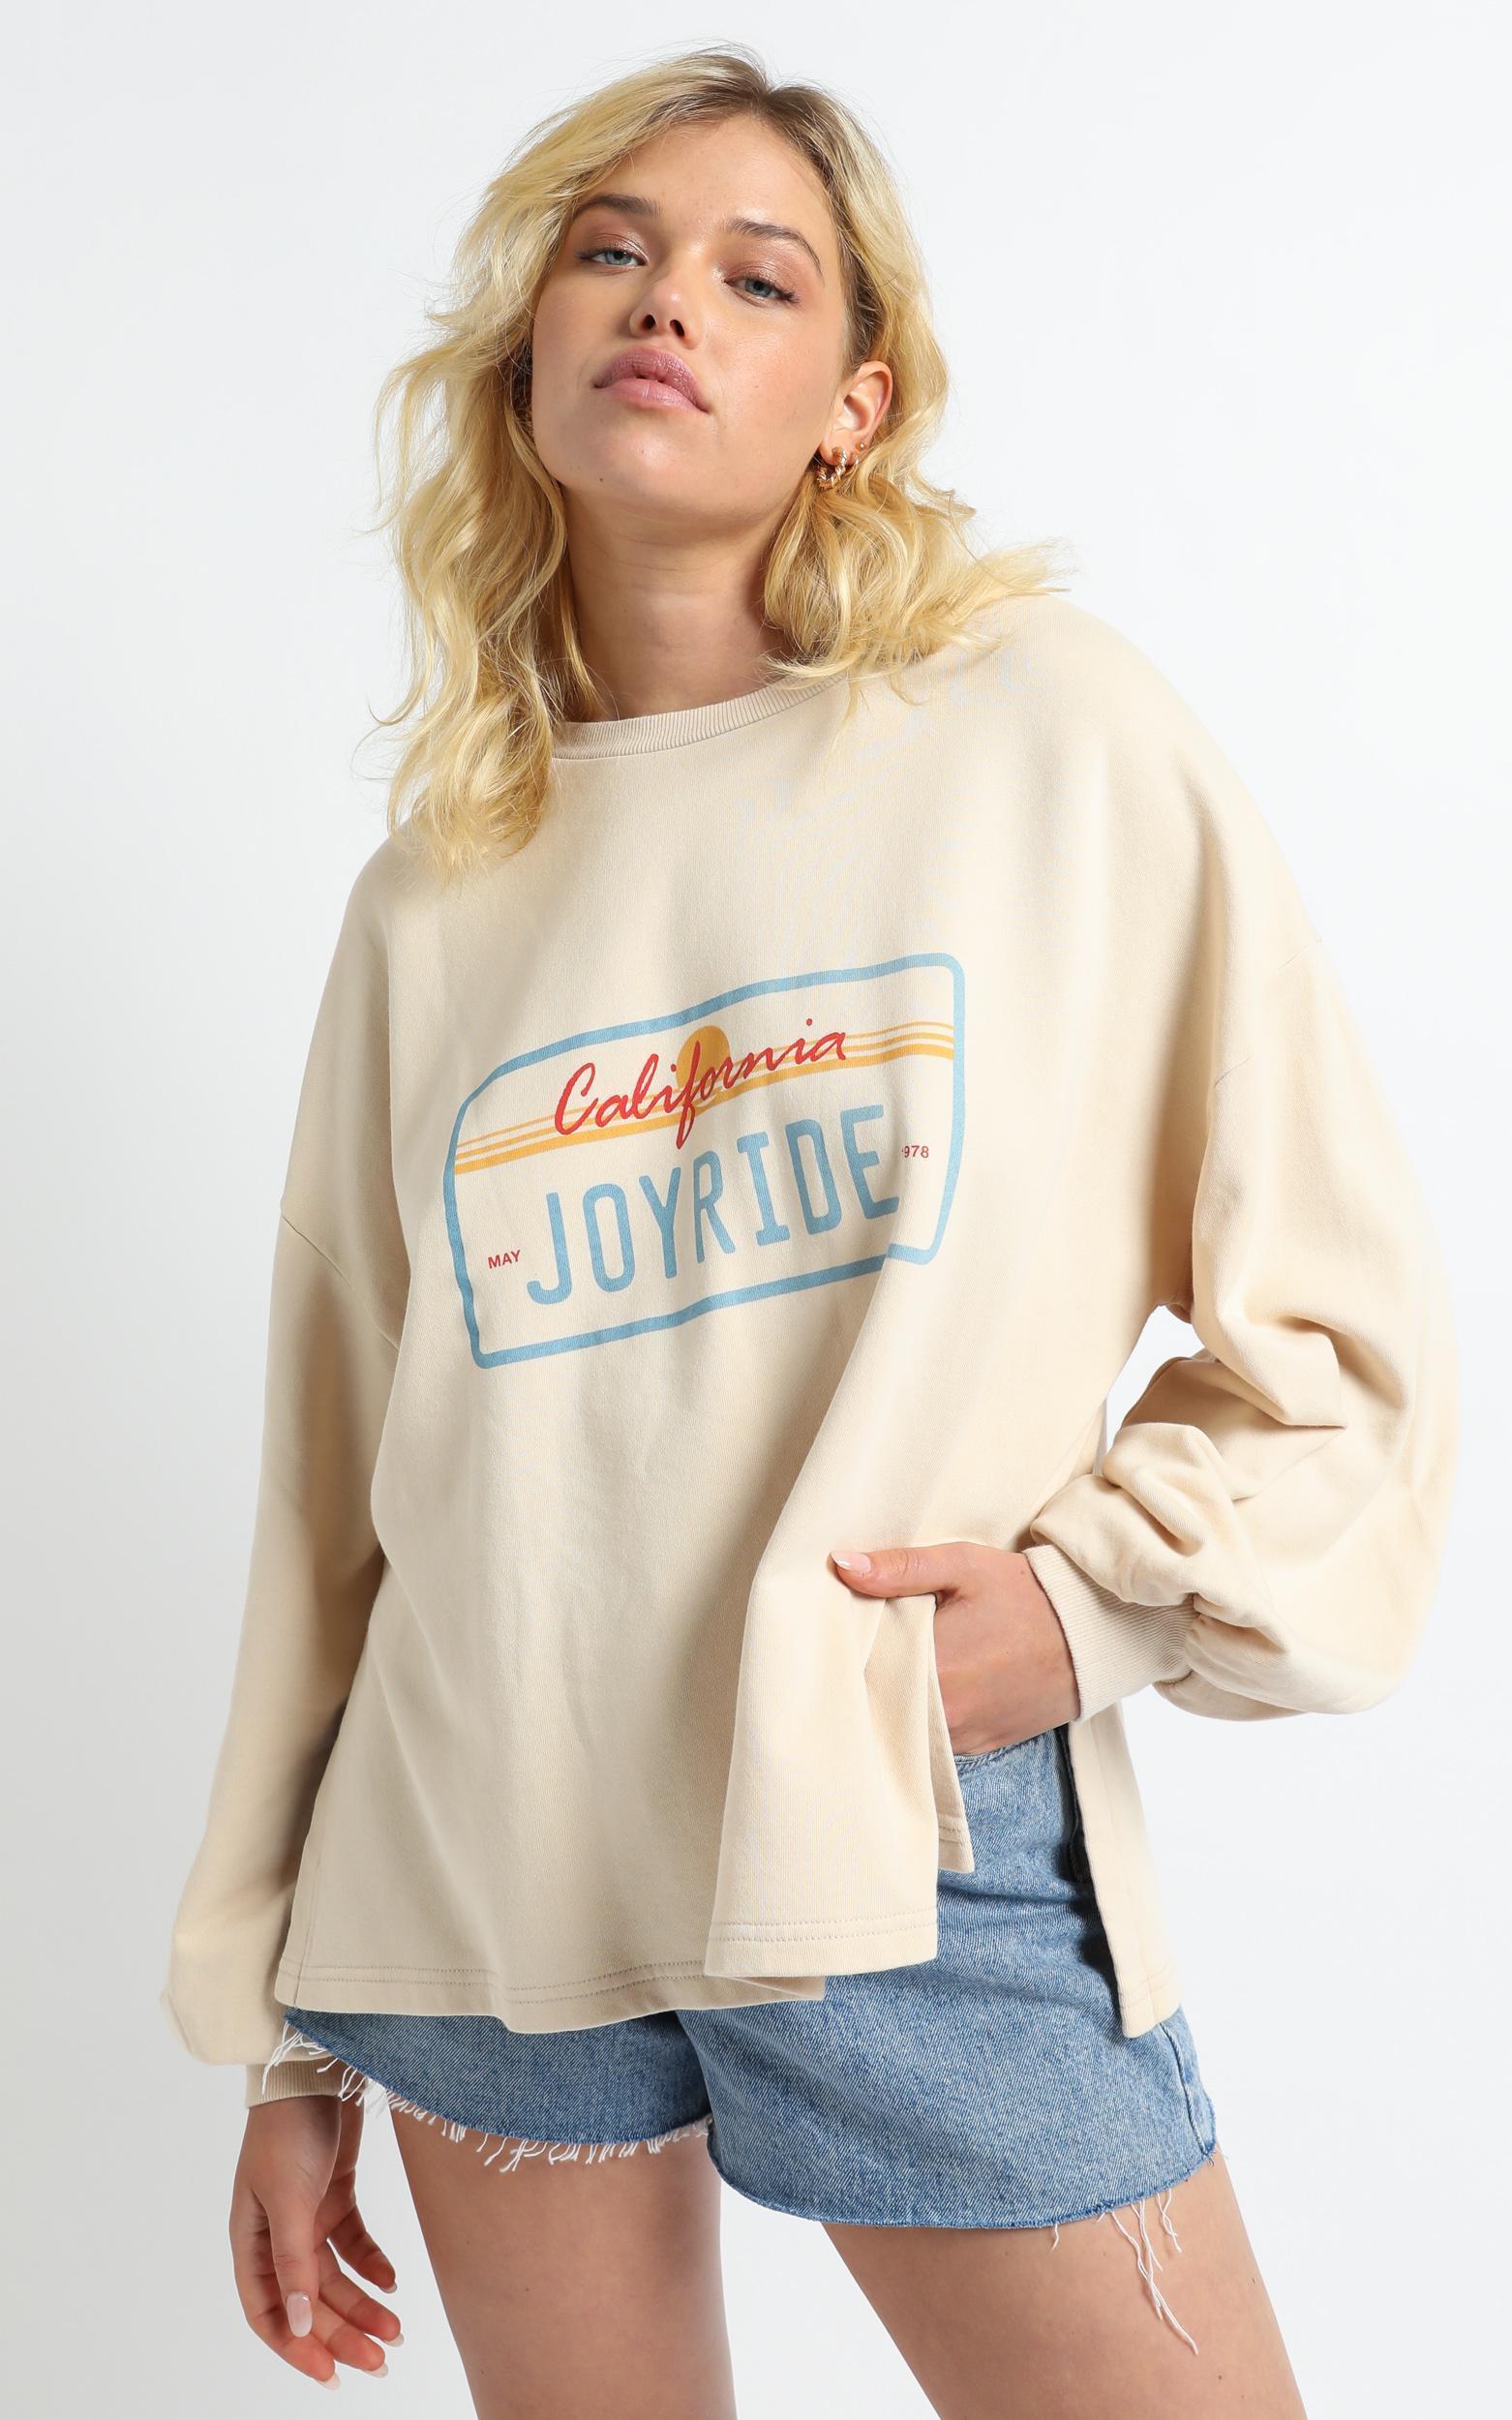 Charlie Holiday - Joyride Sweatshirt in Birch - XS, Beige, hi-res image number null